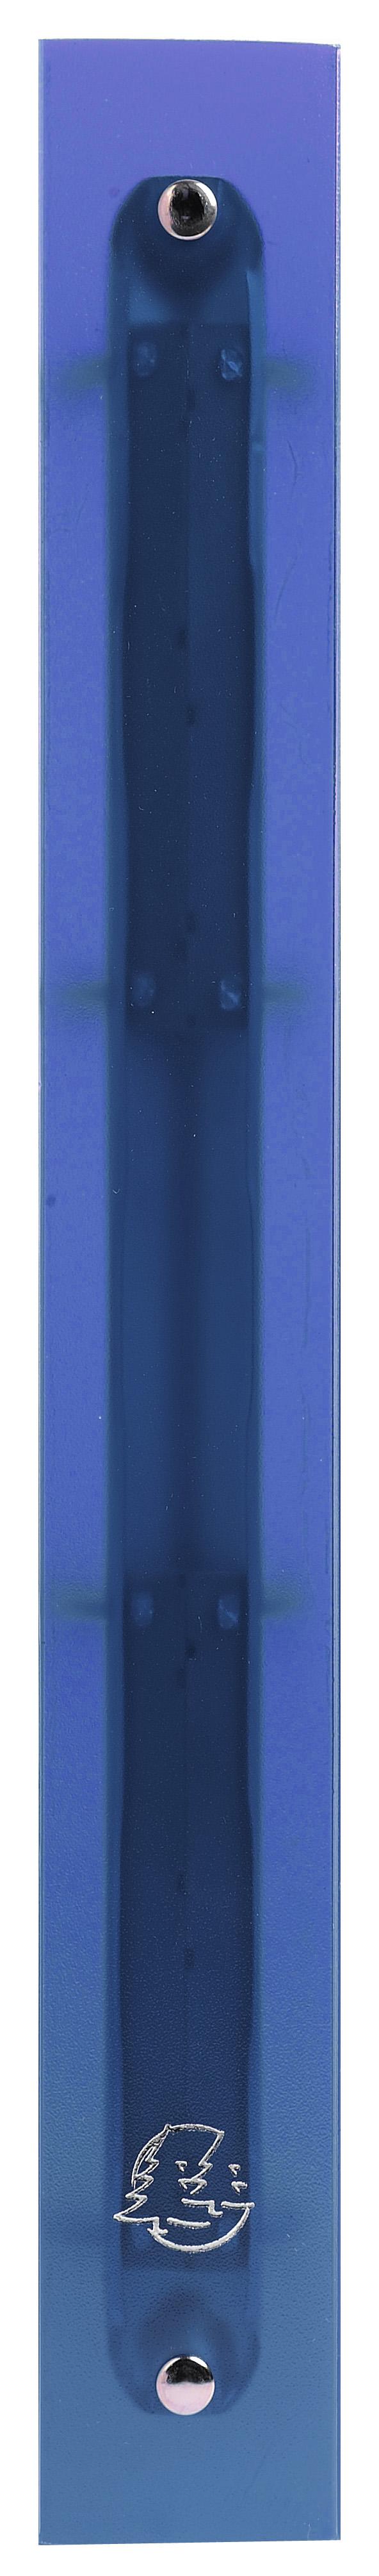 Classeur 4 anneaux 30mm polypropylène chromaline 7/10e Krea Cover - A4 maxi